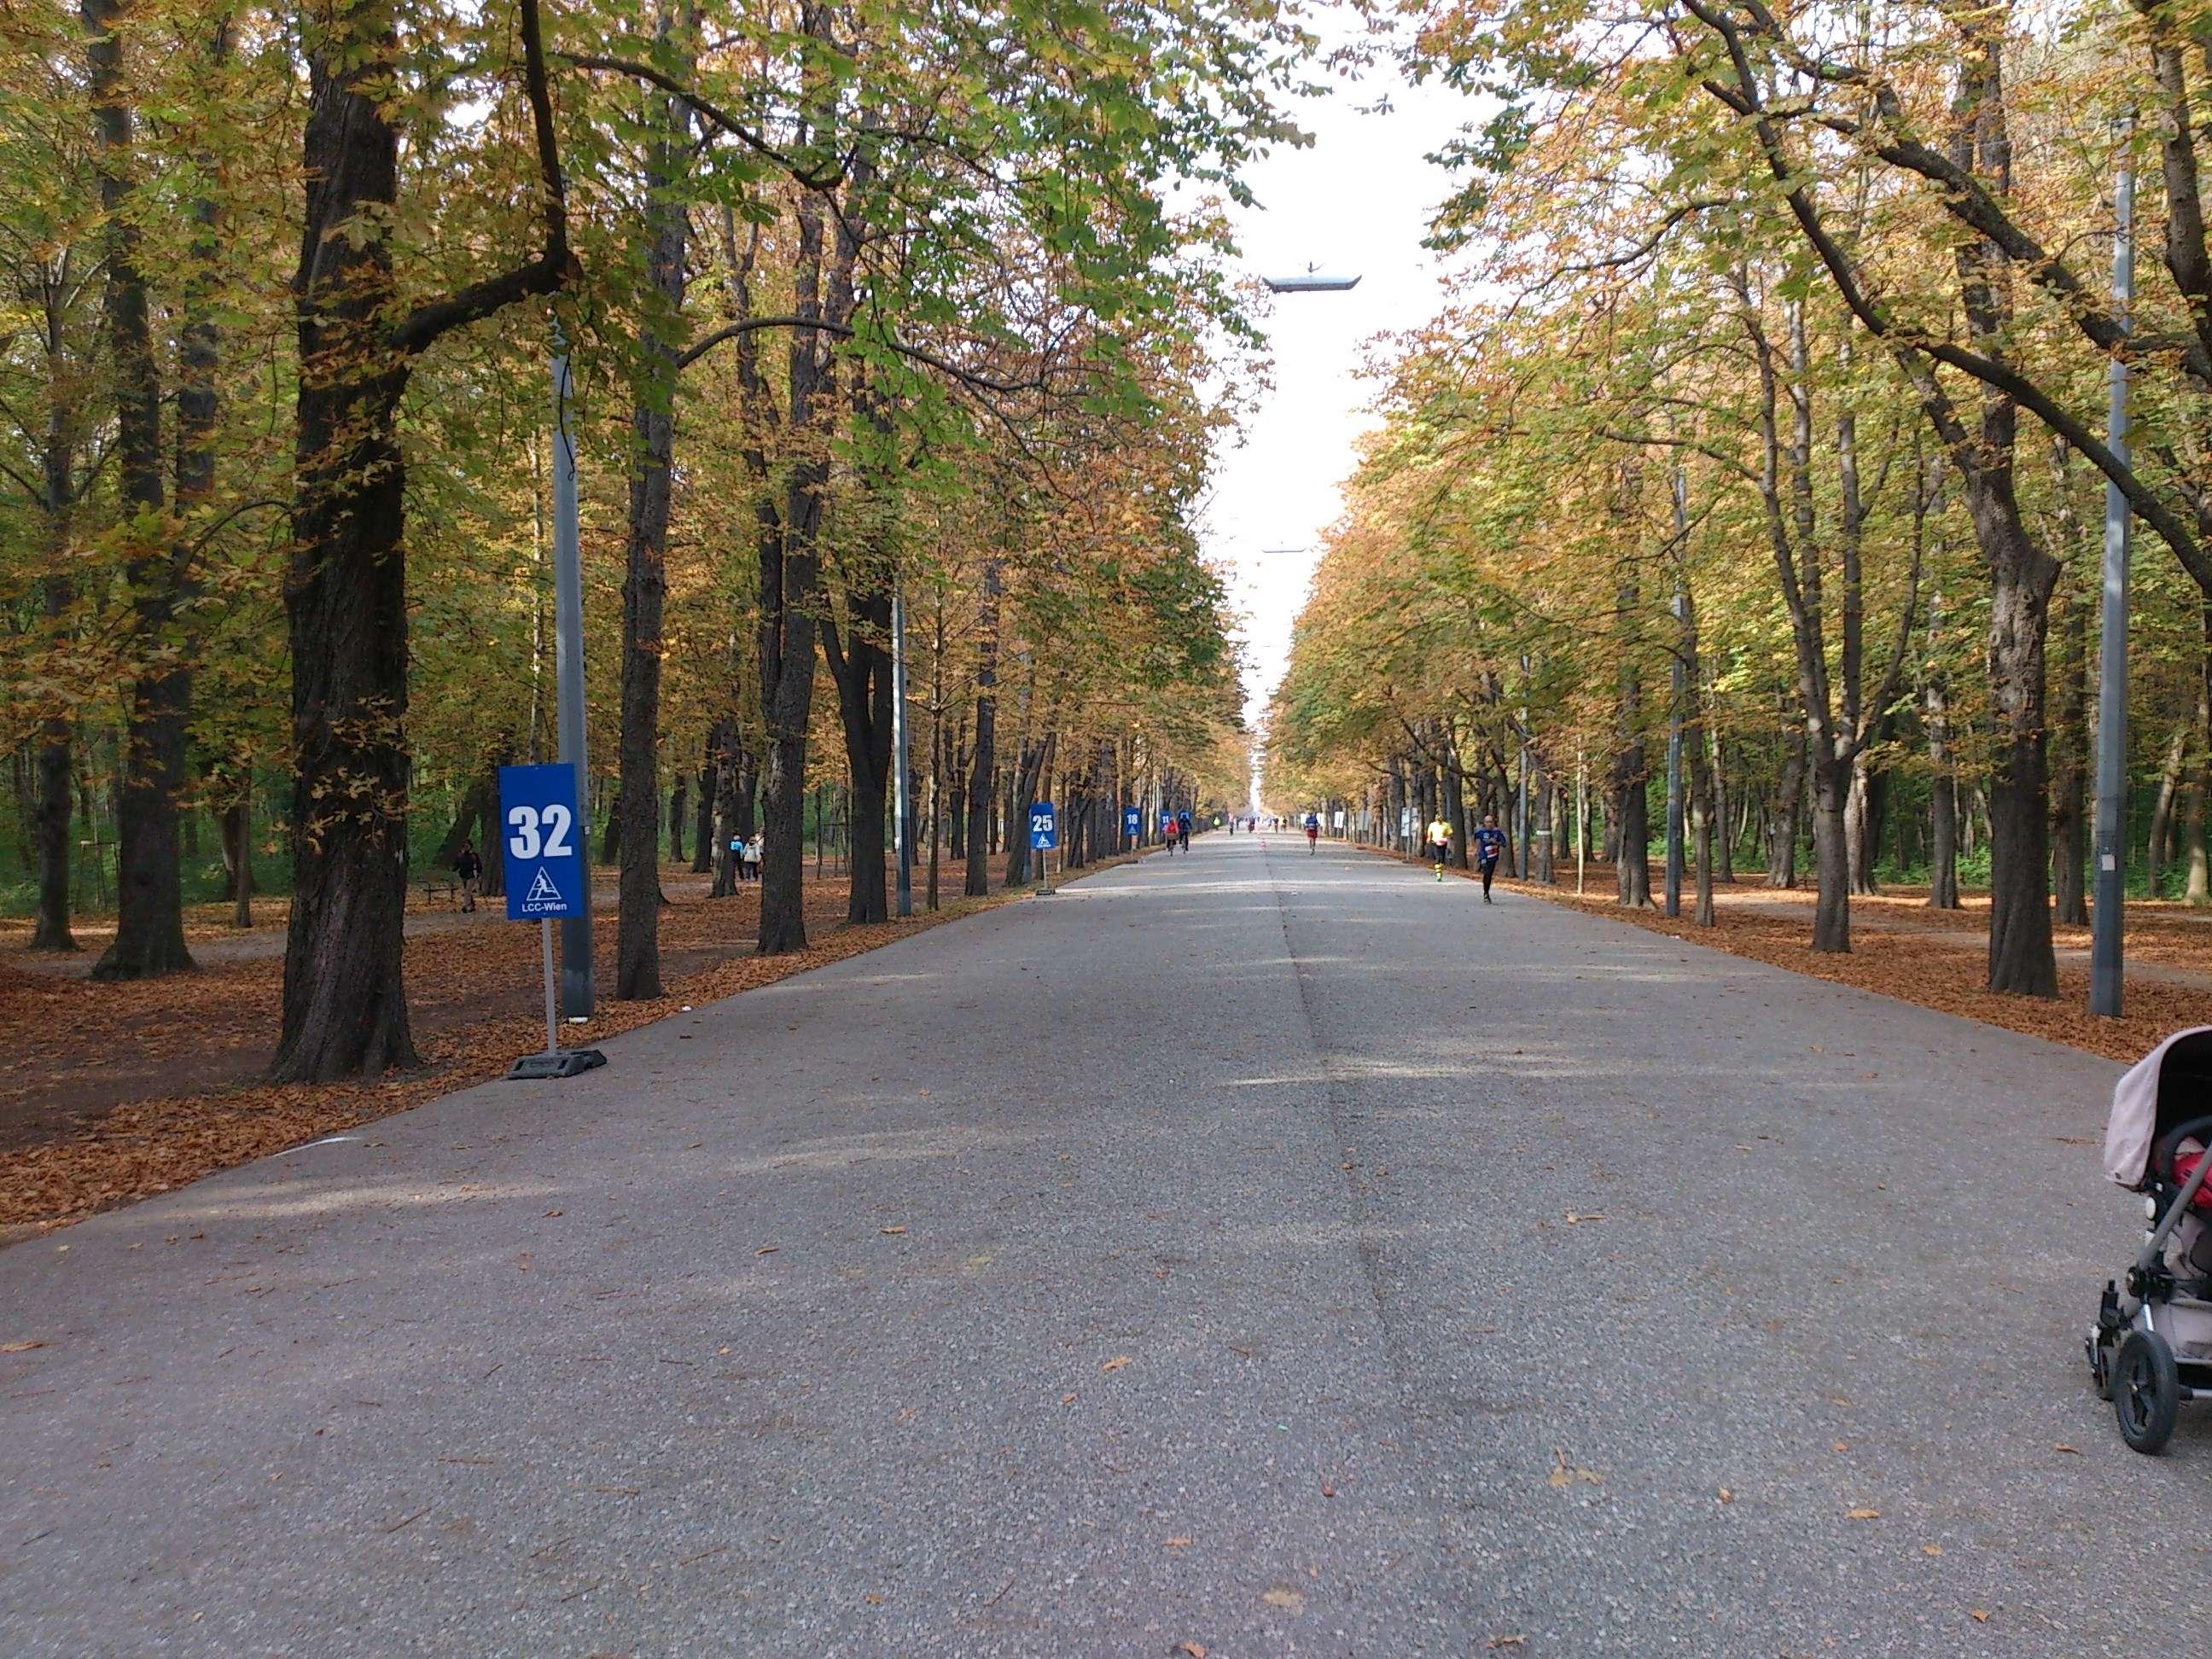 Prater - Hauptallee s novim oznakama kilometara